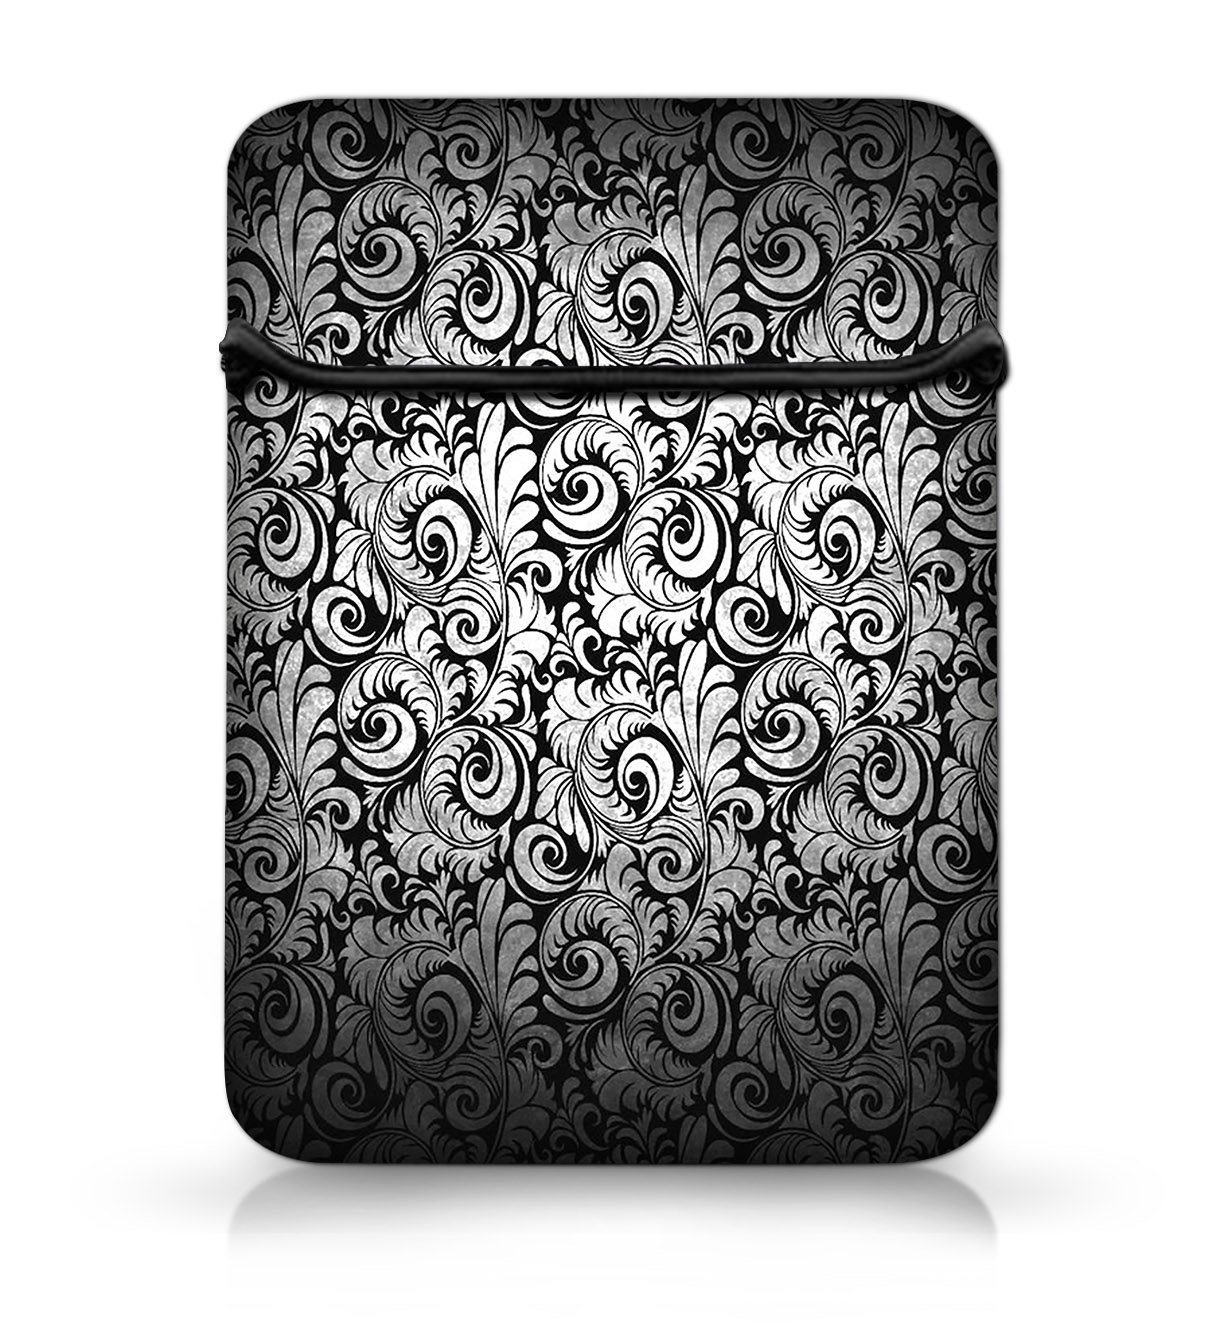 "Gray Fashion New 13"" 13.1"" 13.3"" Laptop Notebook Sleeve Flip Cover Case Protector For Apple MacBook 13"" /HP Folio 13 /Samsung Ultrabook Series 9 13.3"" /SONY VAIO PRO 13 13.3"" /13"" Toshiba Satellite /Lenovo IdeaPad Yoga 13"" /Dell Inspiron 13z /Dell Inspiron 13R /Hewlett Packard 13.3-Inch /Sony VAIO"